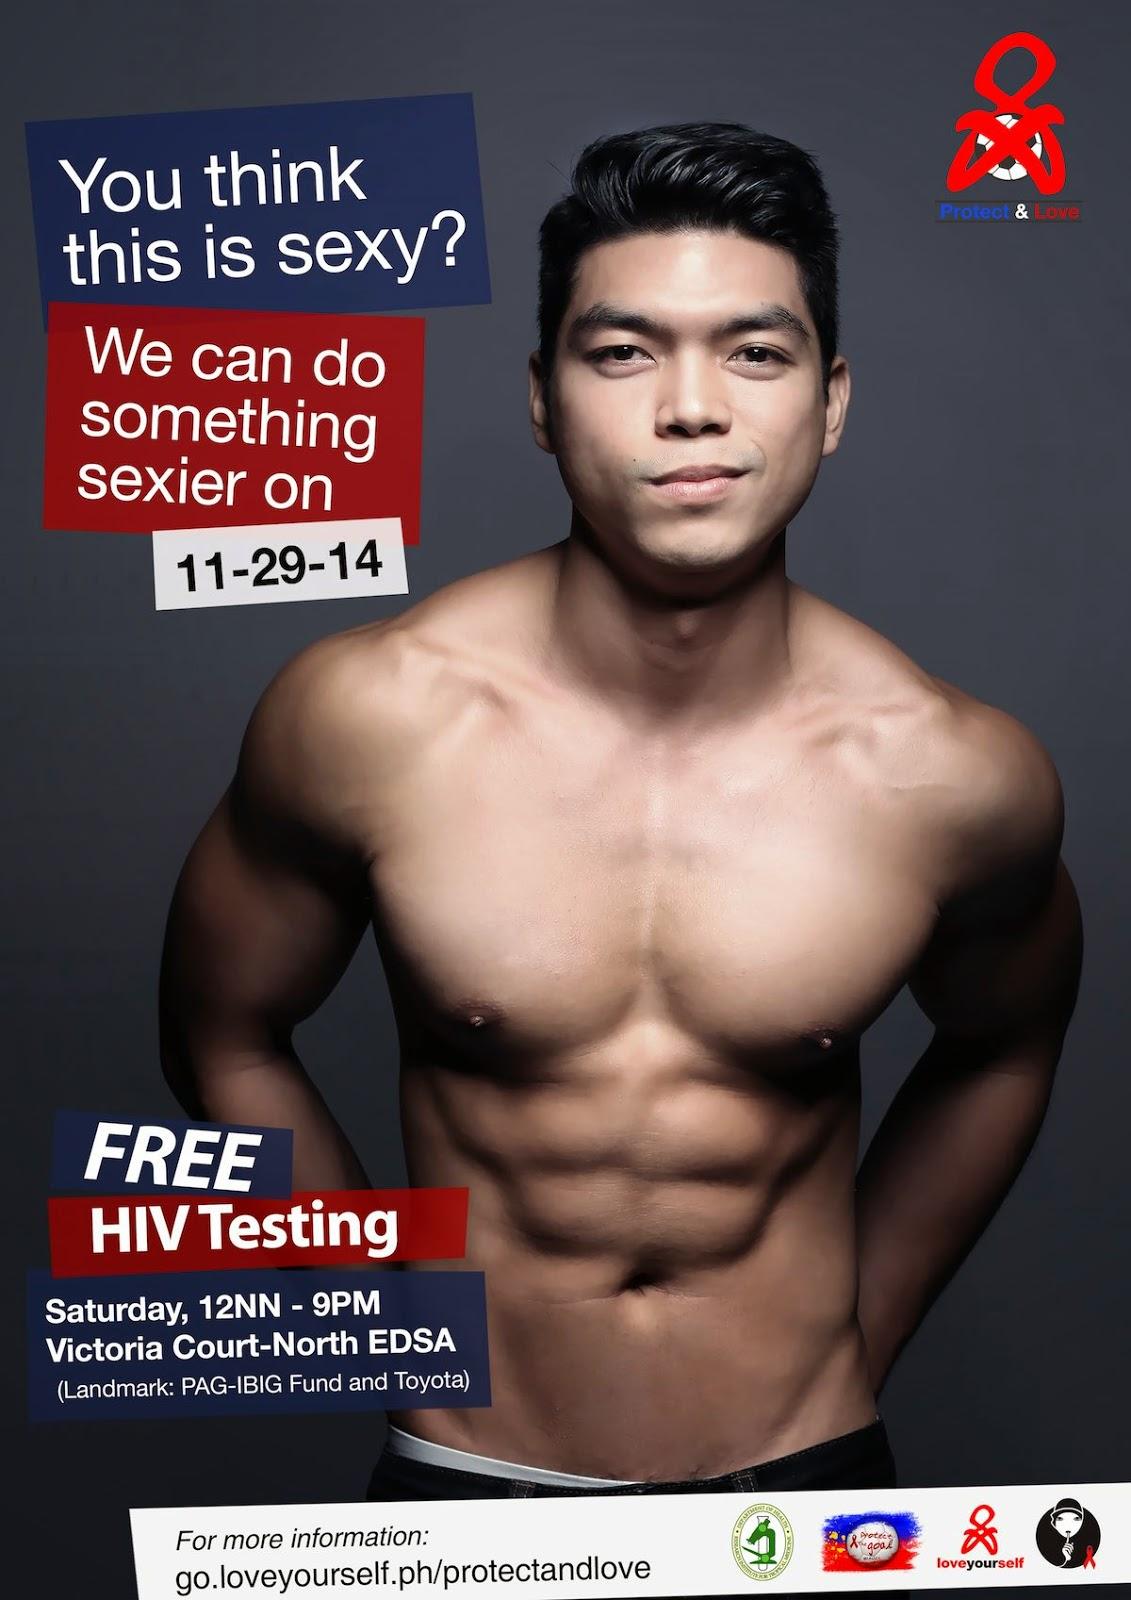 Protect & Love: Free HIV Testing